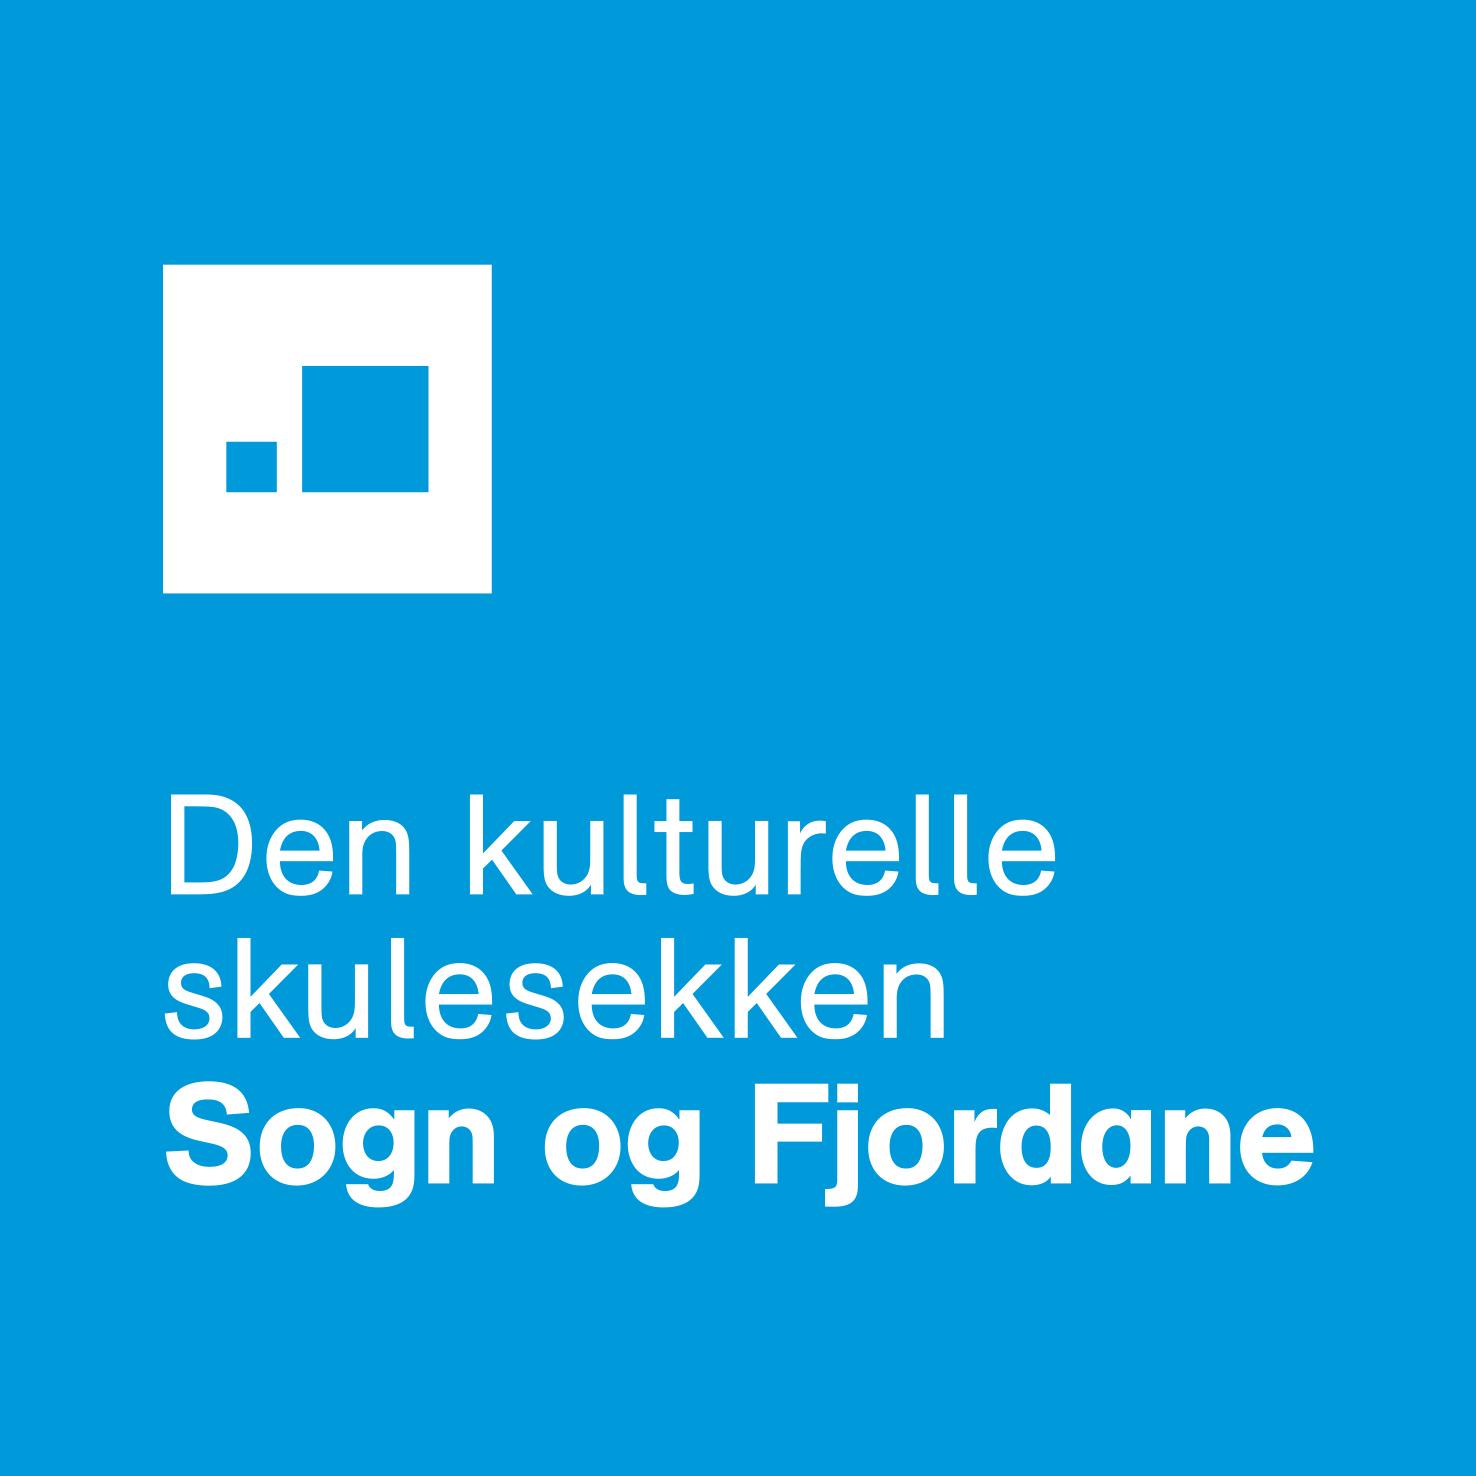 Facebook_blaa_SF_Den_kulturelle_skulesekken_Logo_cmyk.jpg